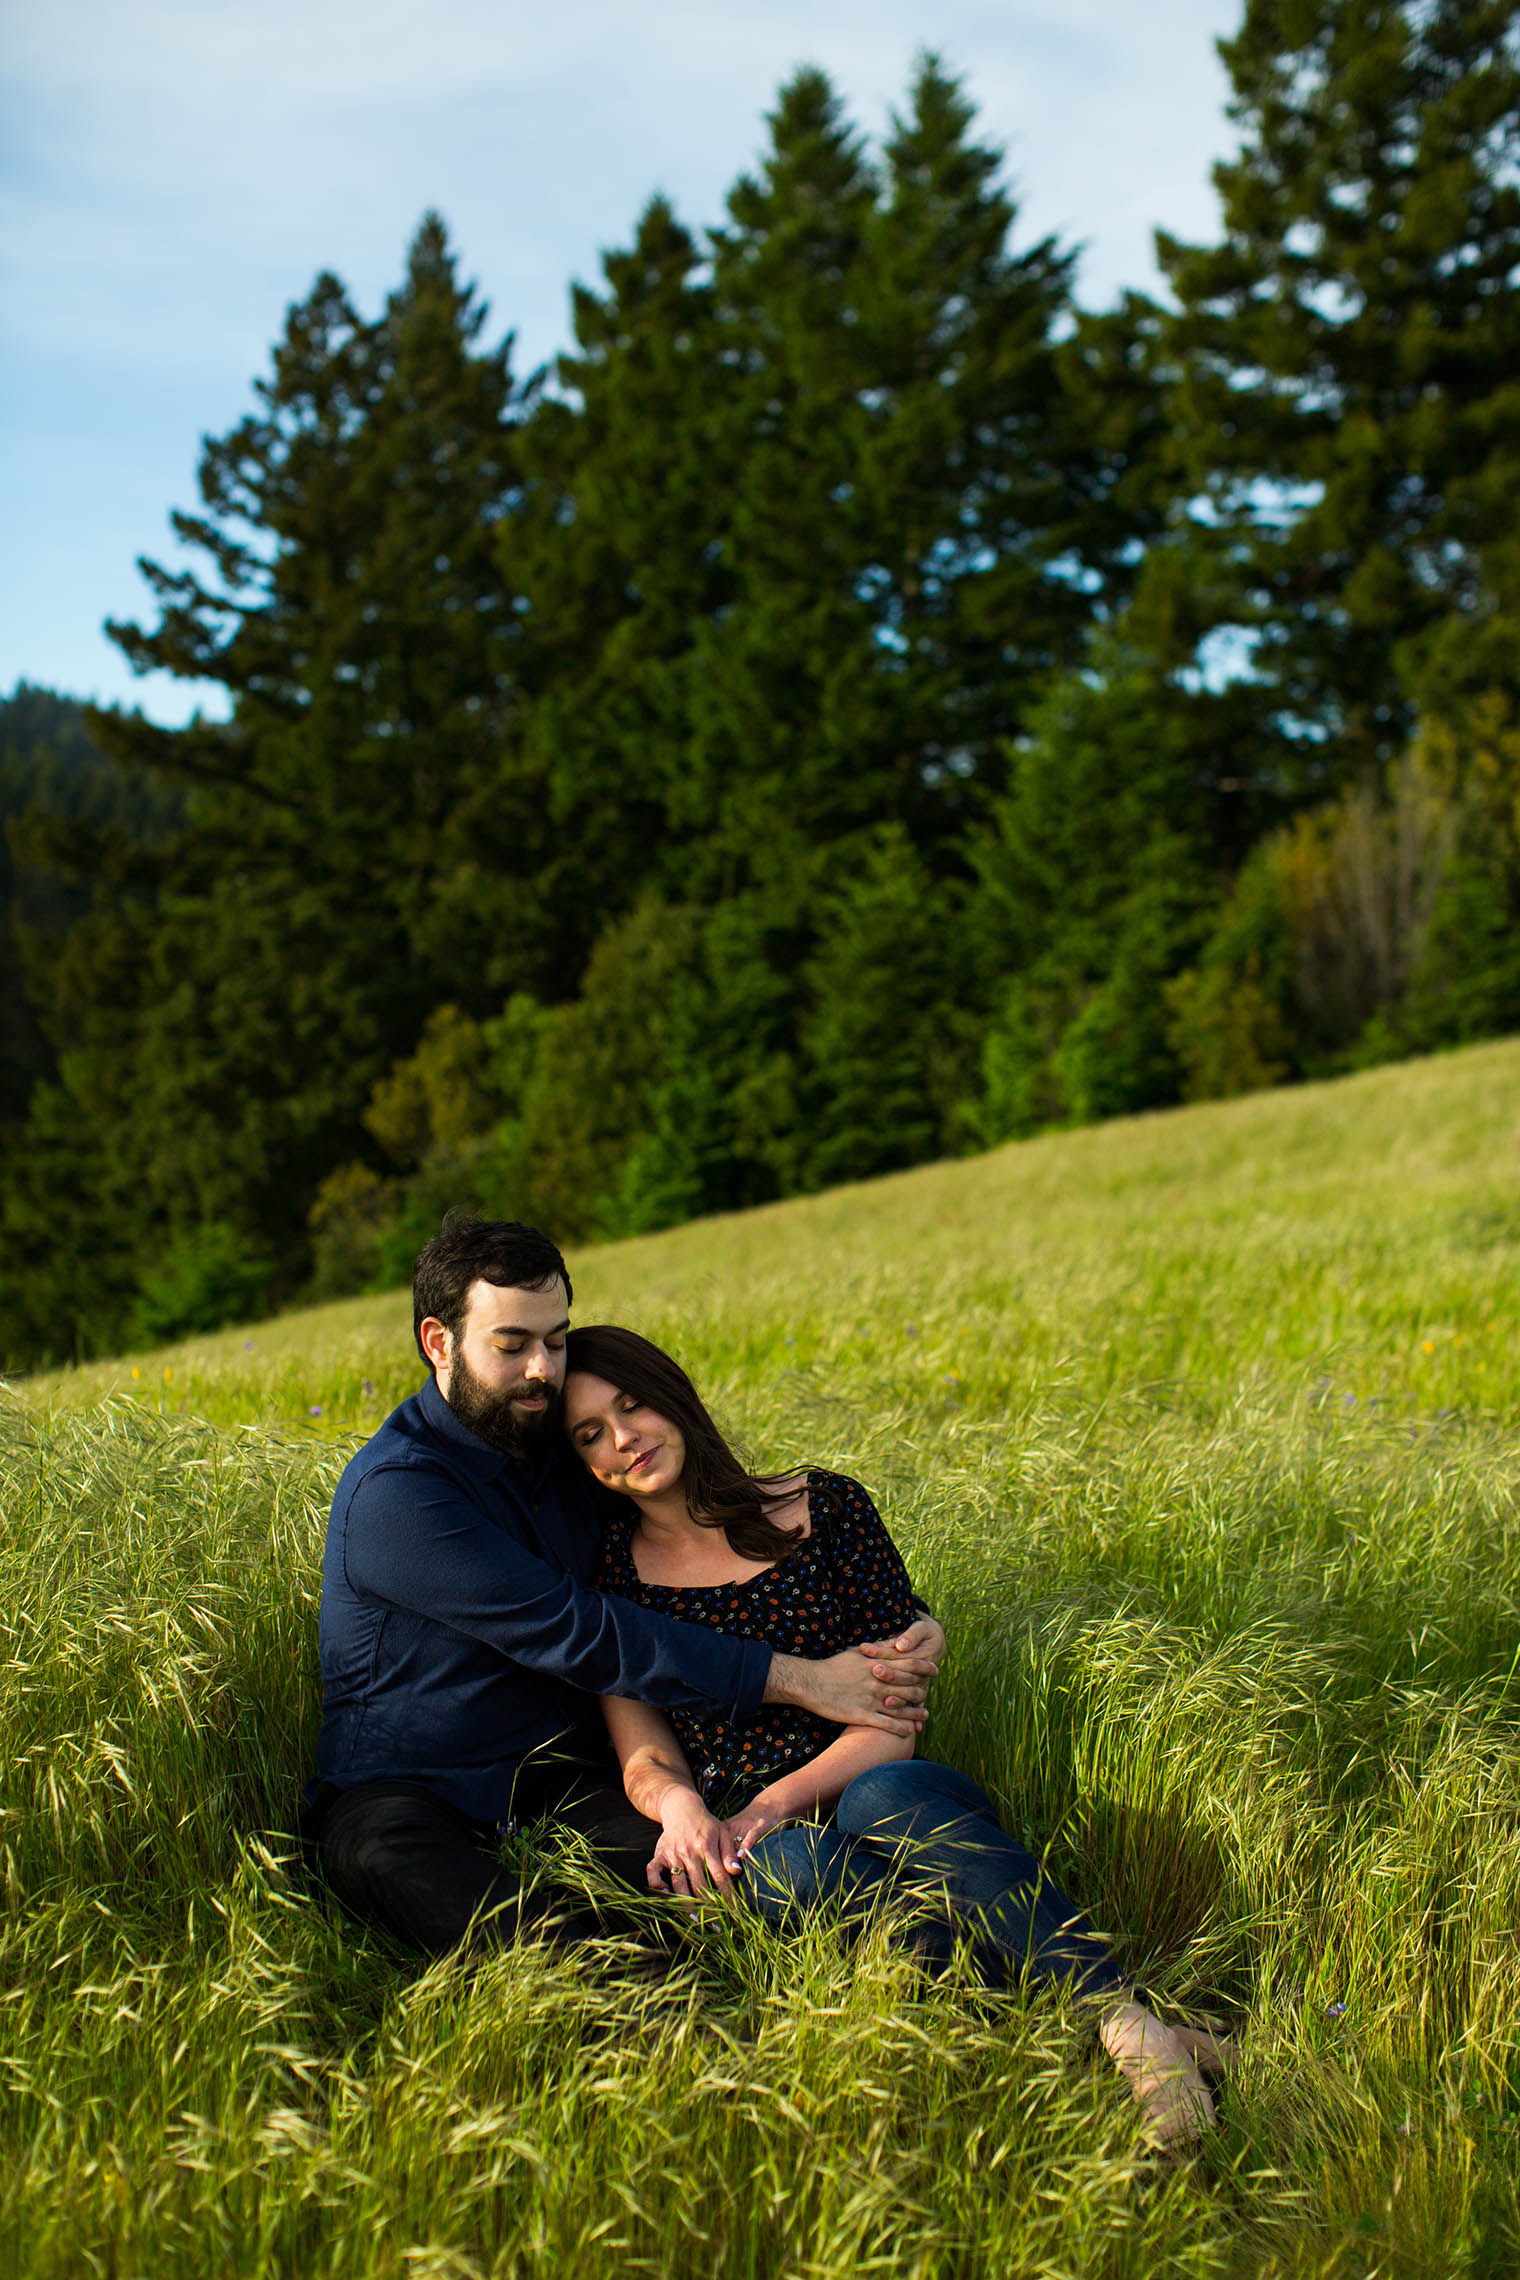 Engagement session at Mount Tamalpais